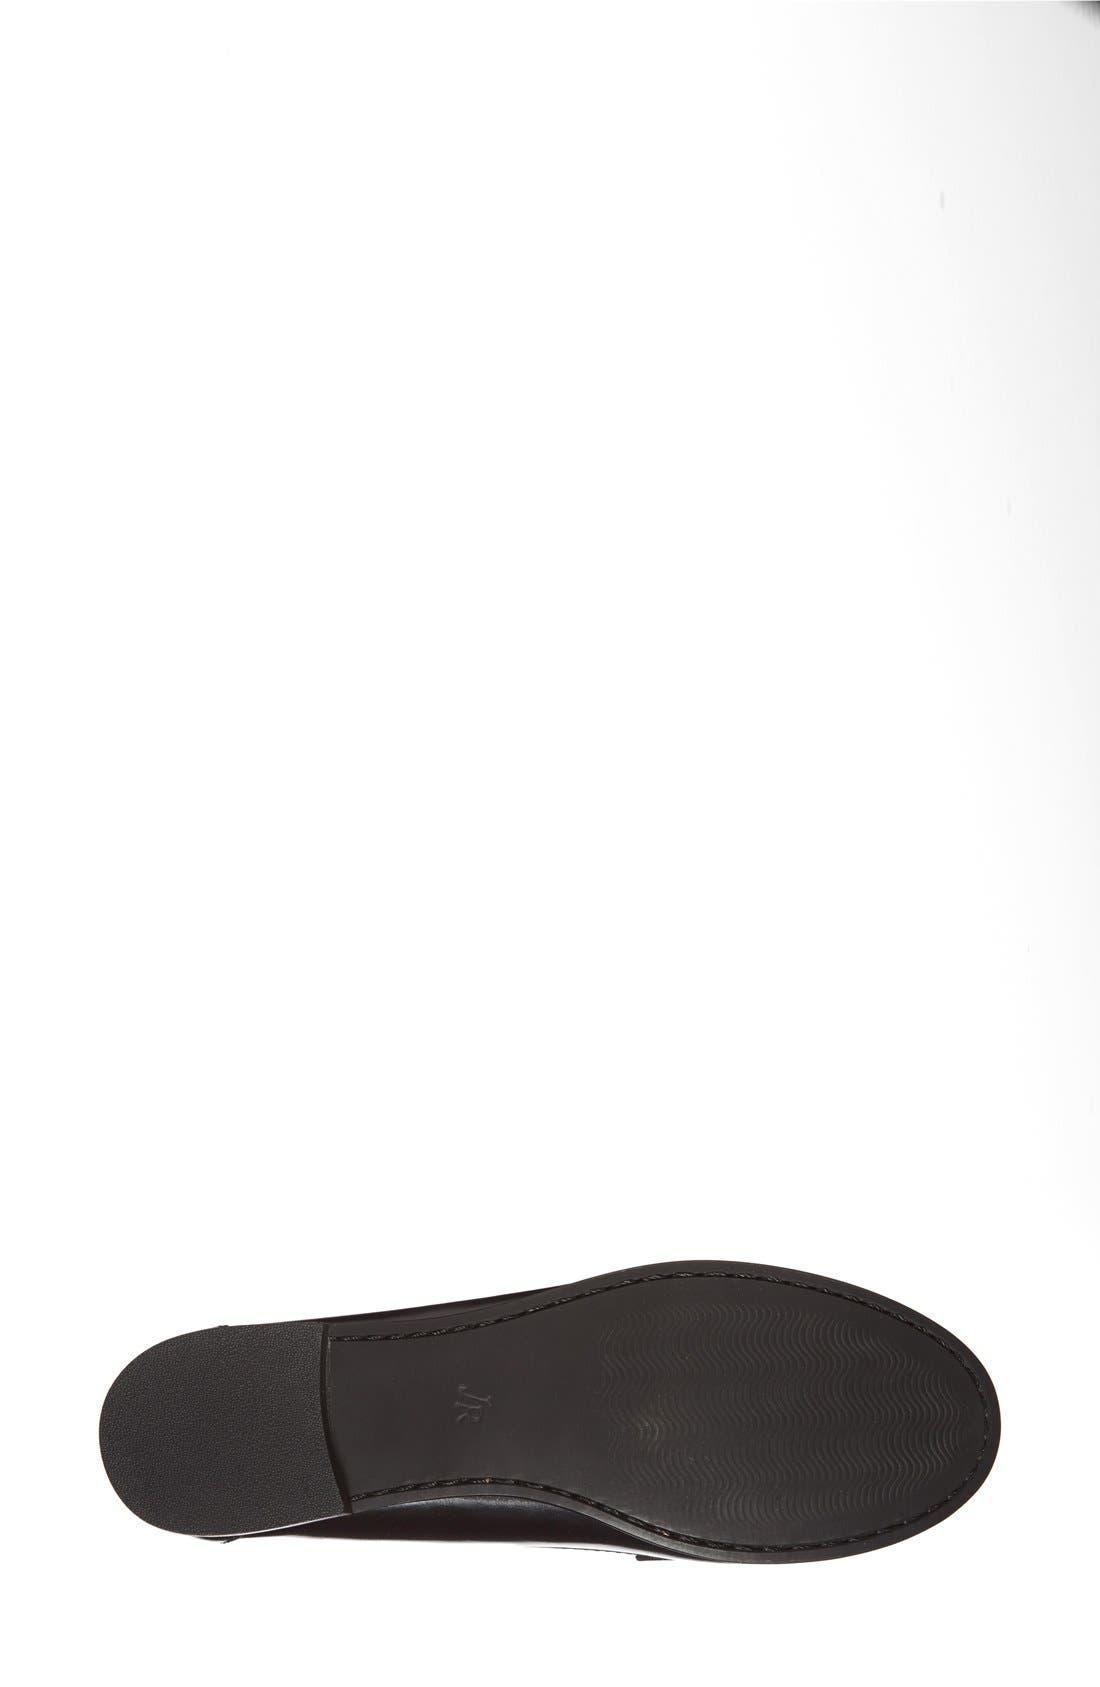 'Quinn' Leather Loafer,                             Alternate thumbnail 19, color,